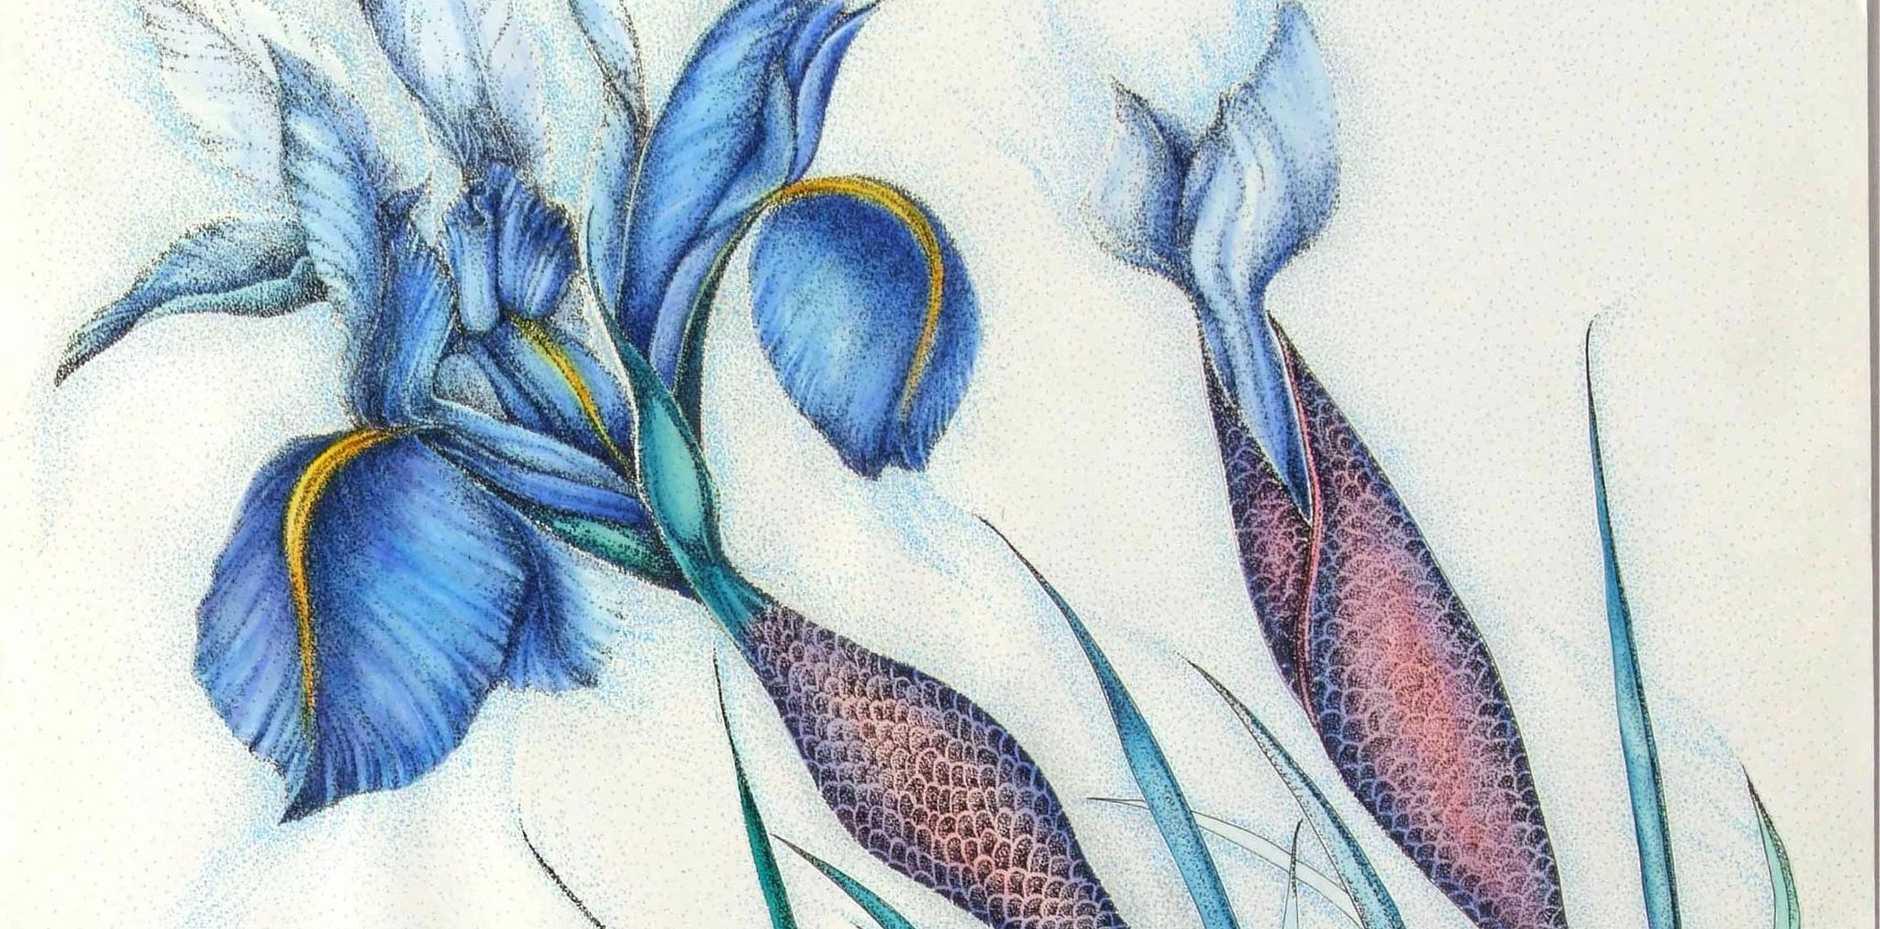 Mermaid Iris, watercolour and pen by Susan Kinneally.